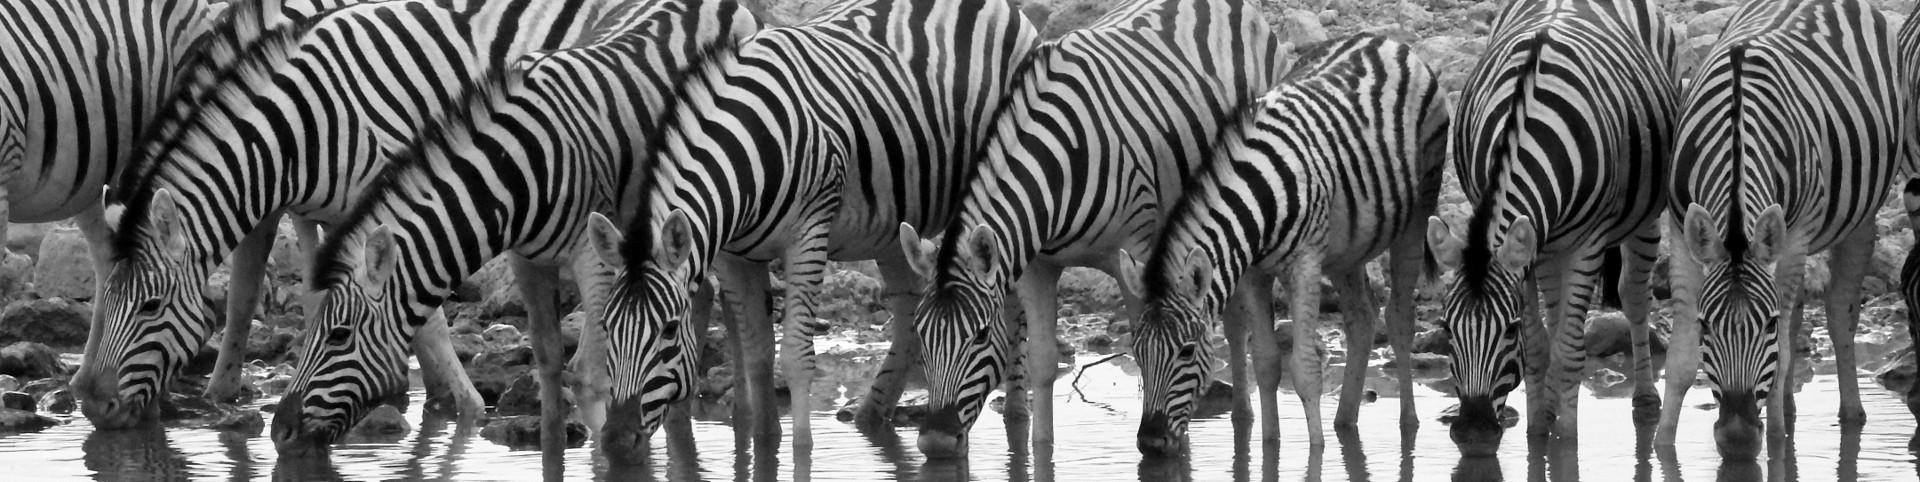 Zebra_drinking_bw_04DSCN7348_1920x482